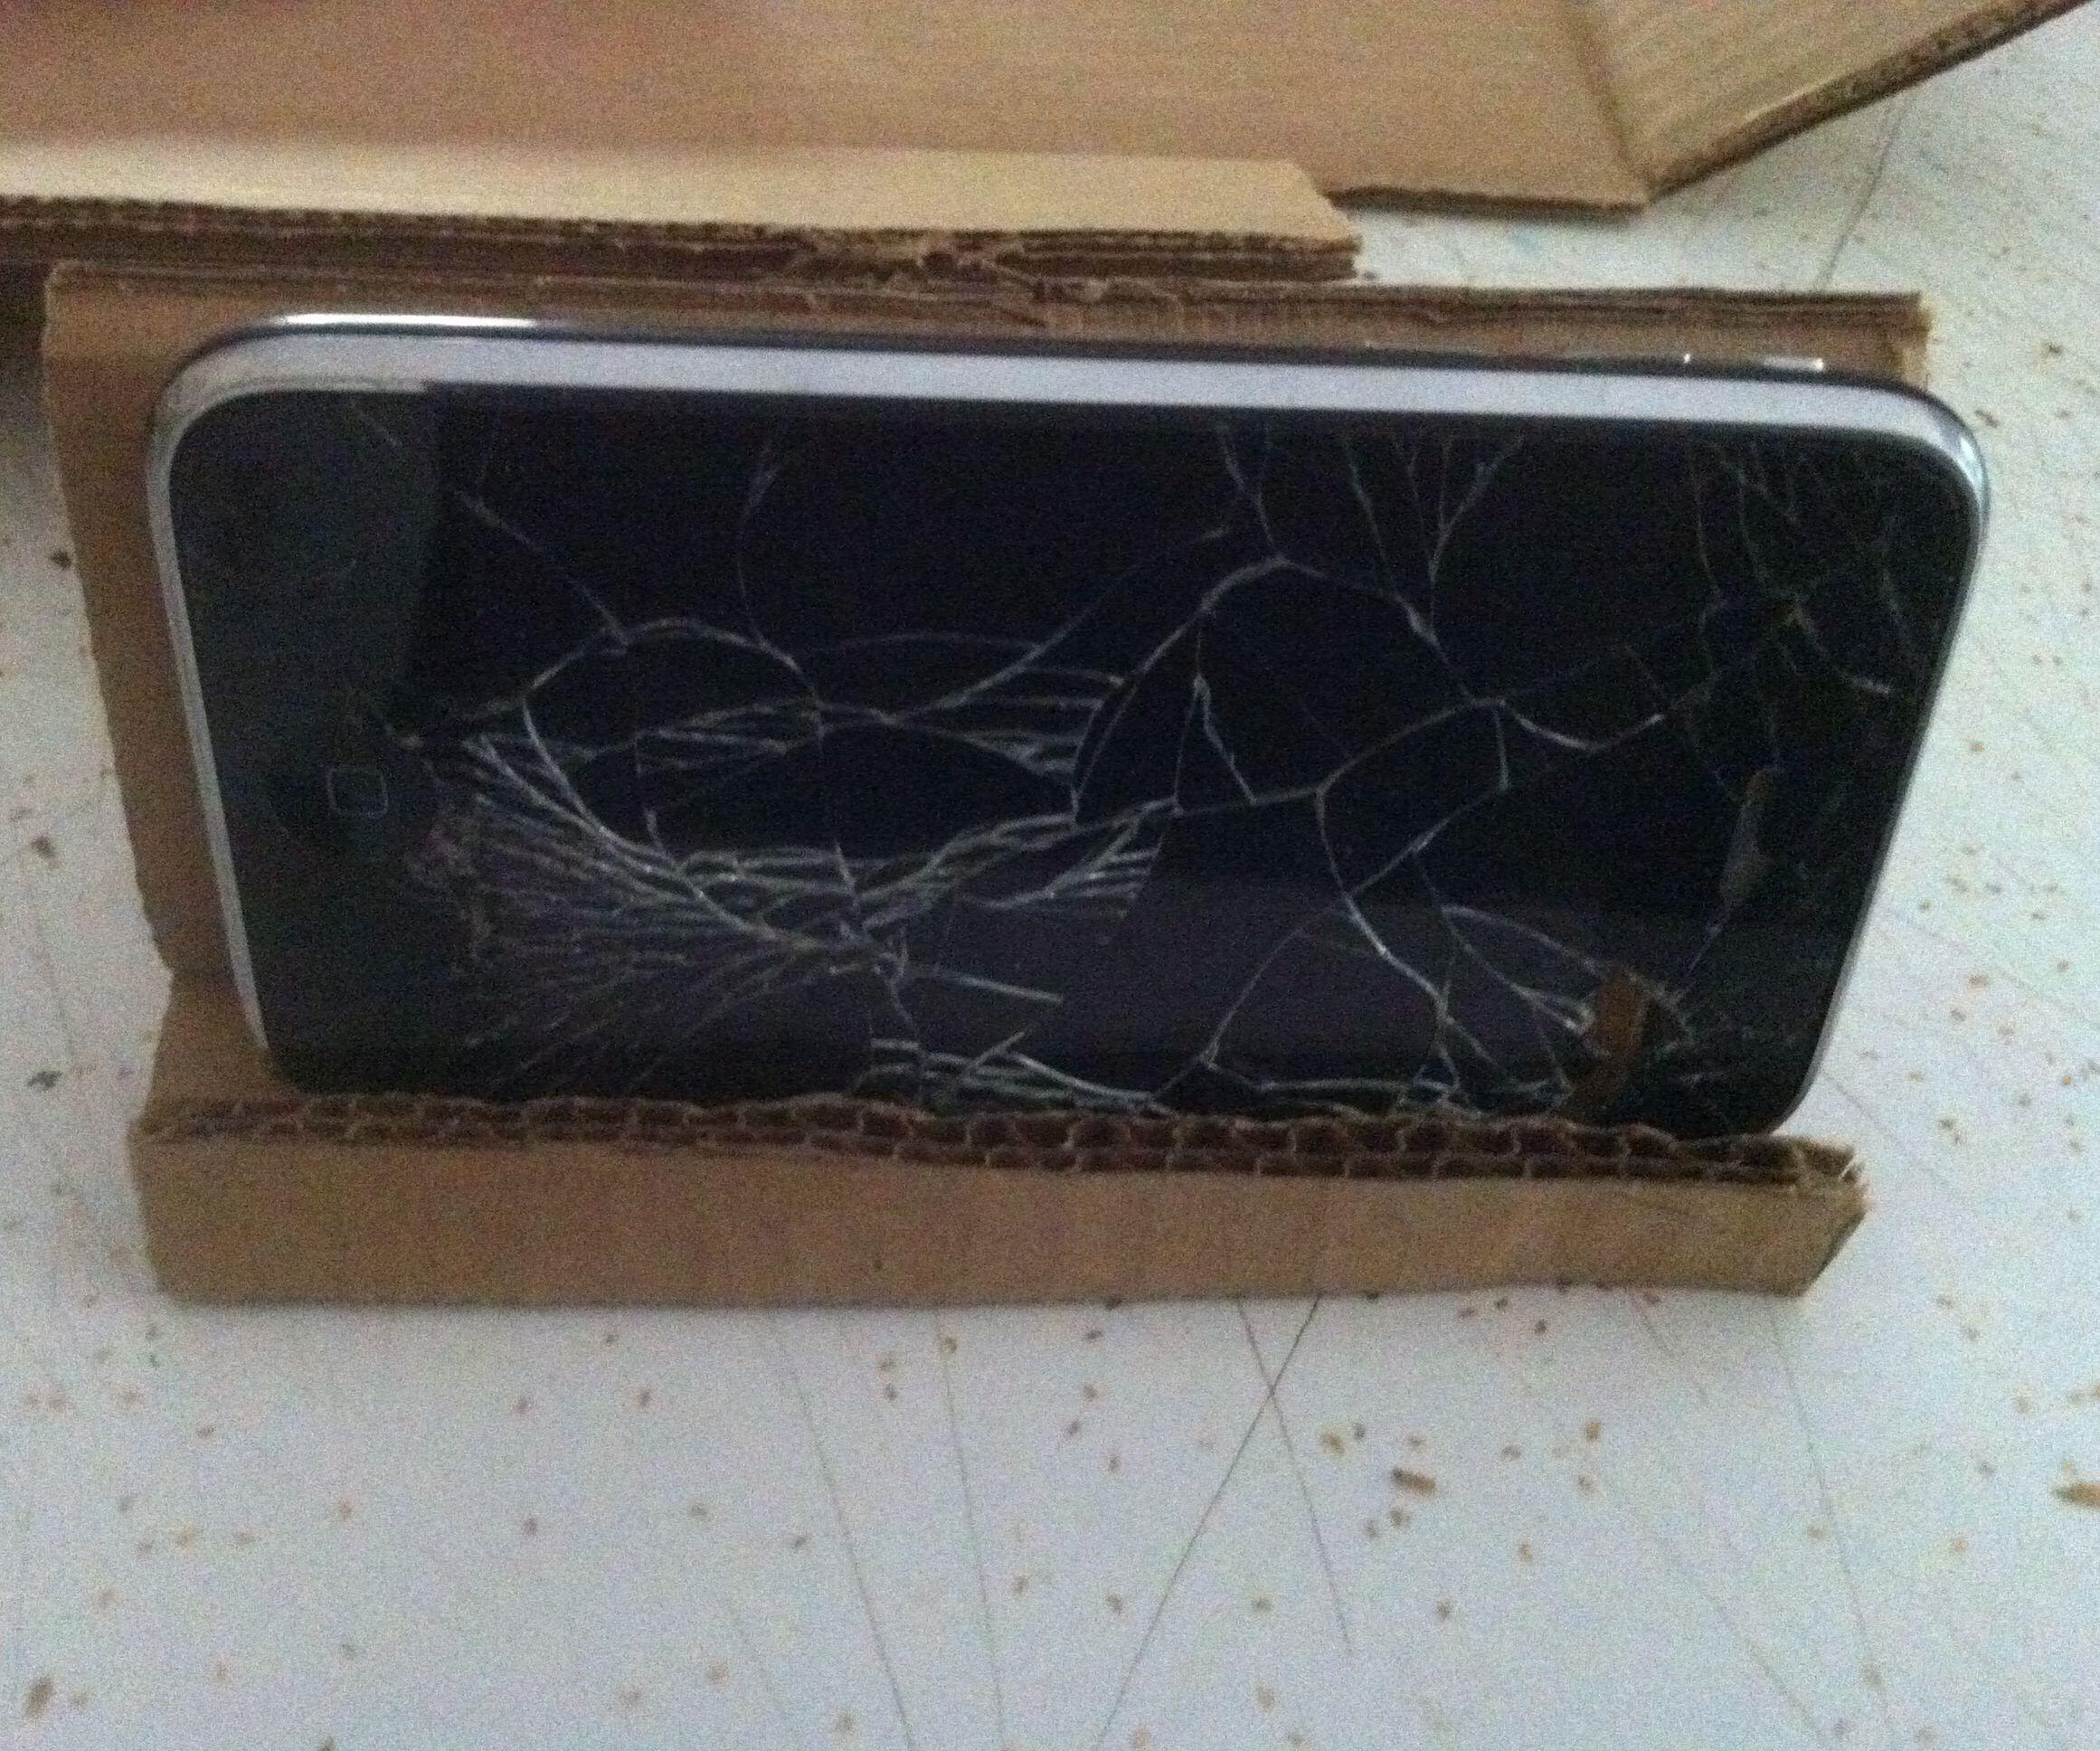 DIY Cardboard Phone Holder